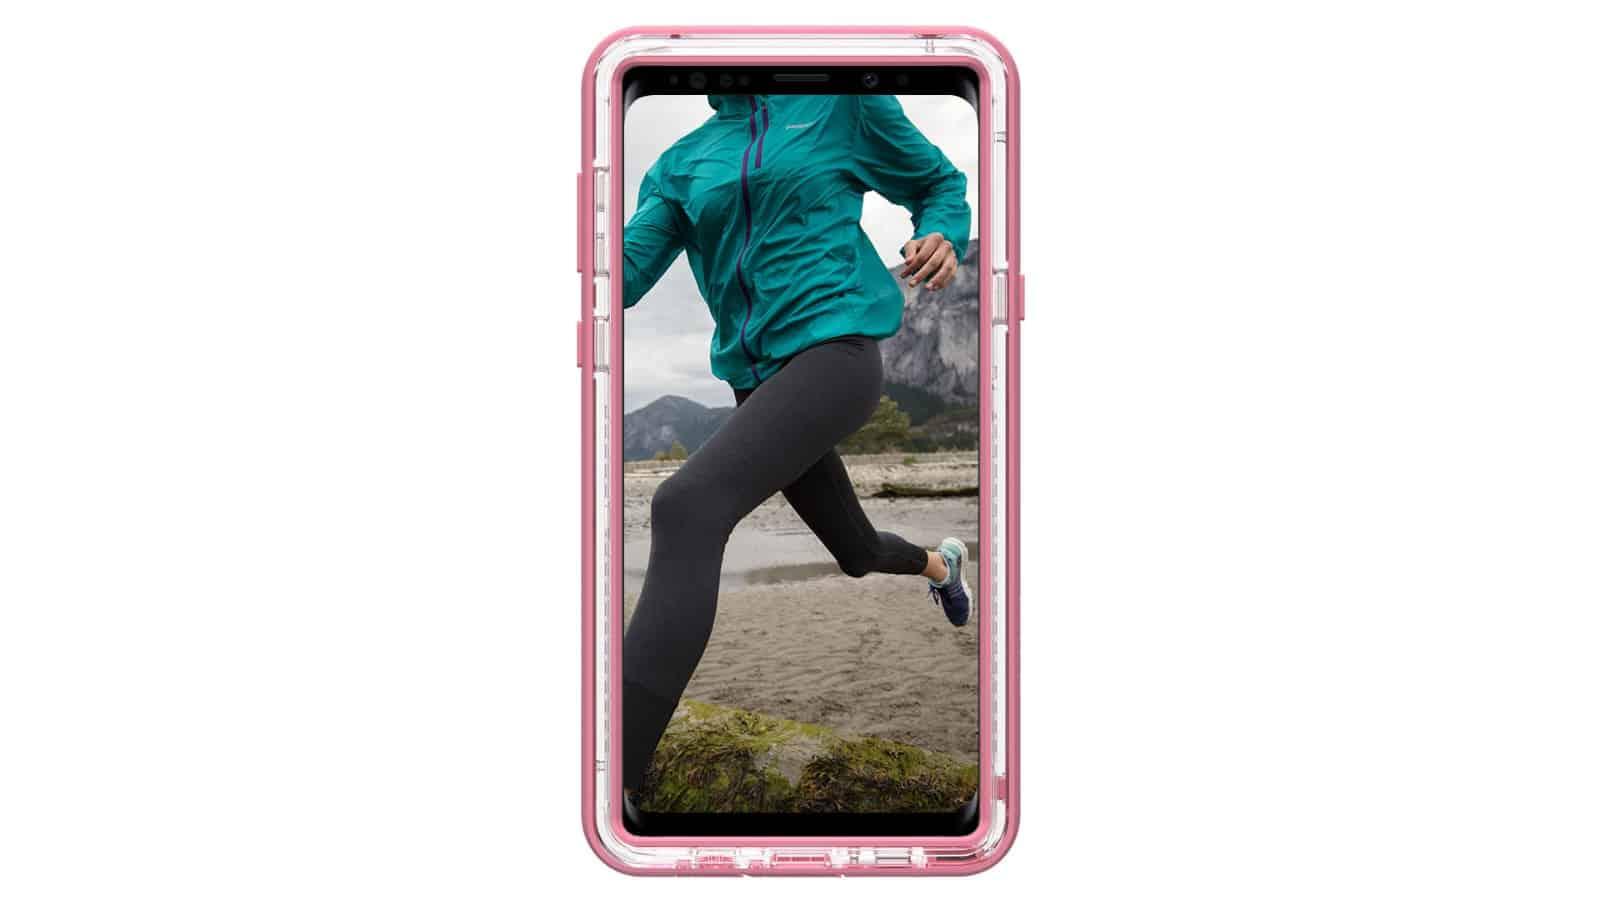 Galaxy Note 9 LifeProof NEXT case 12